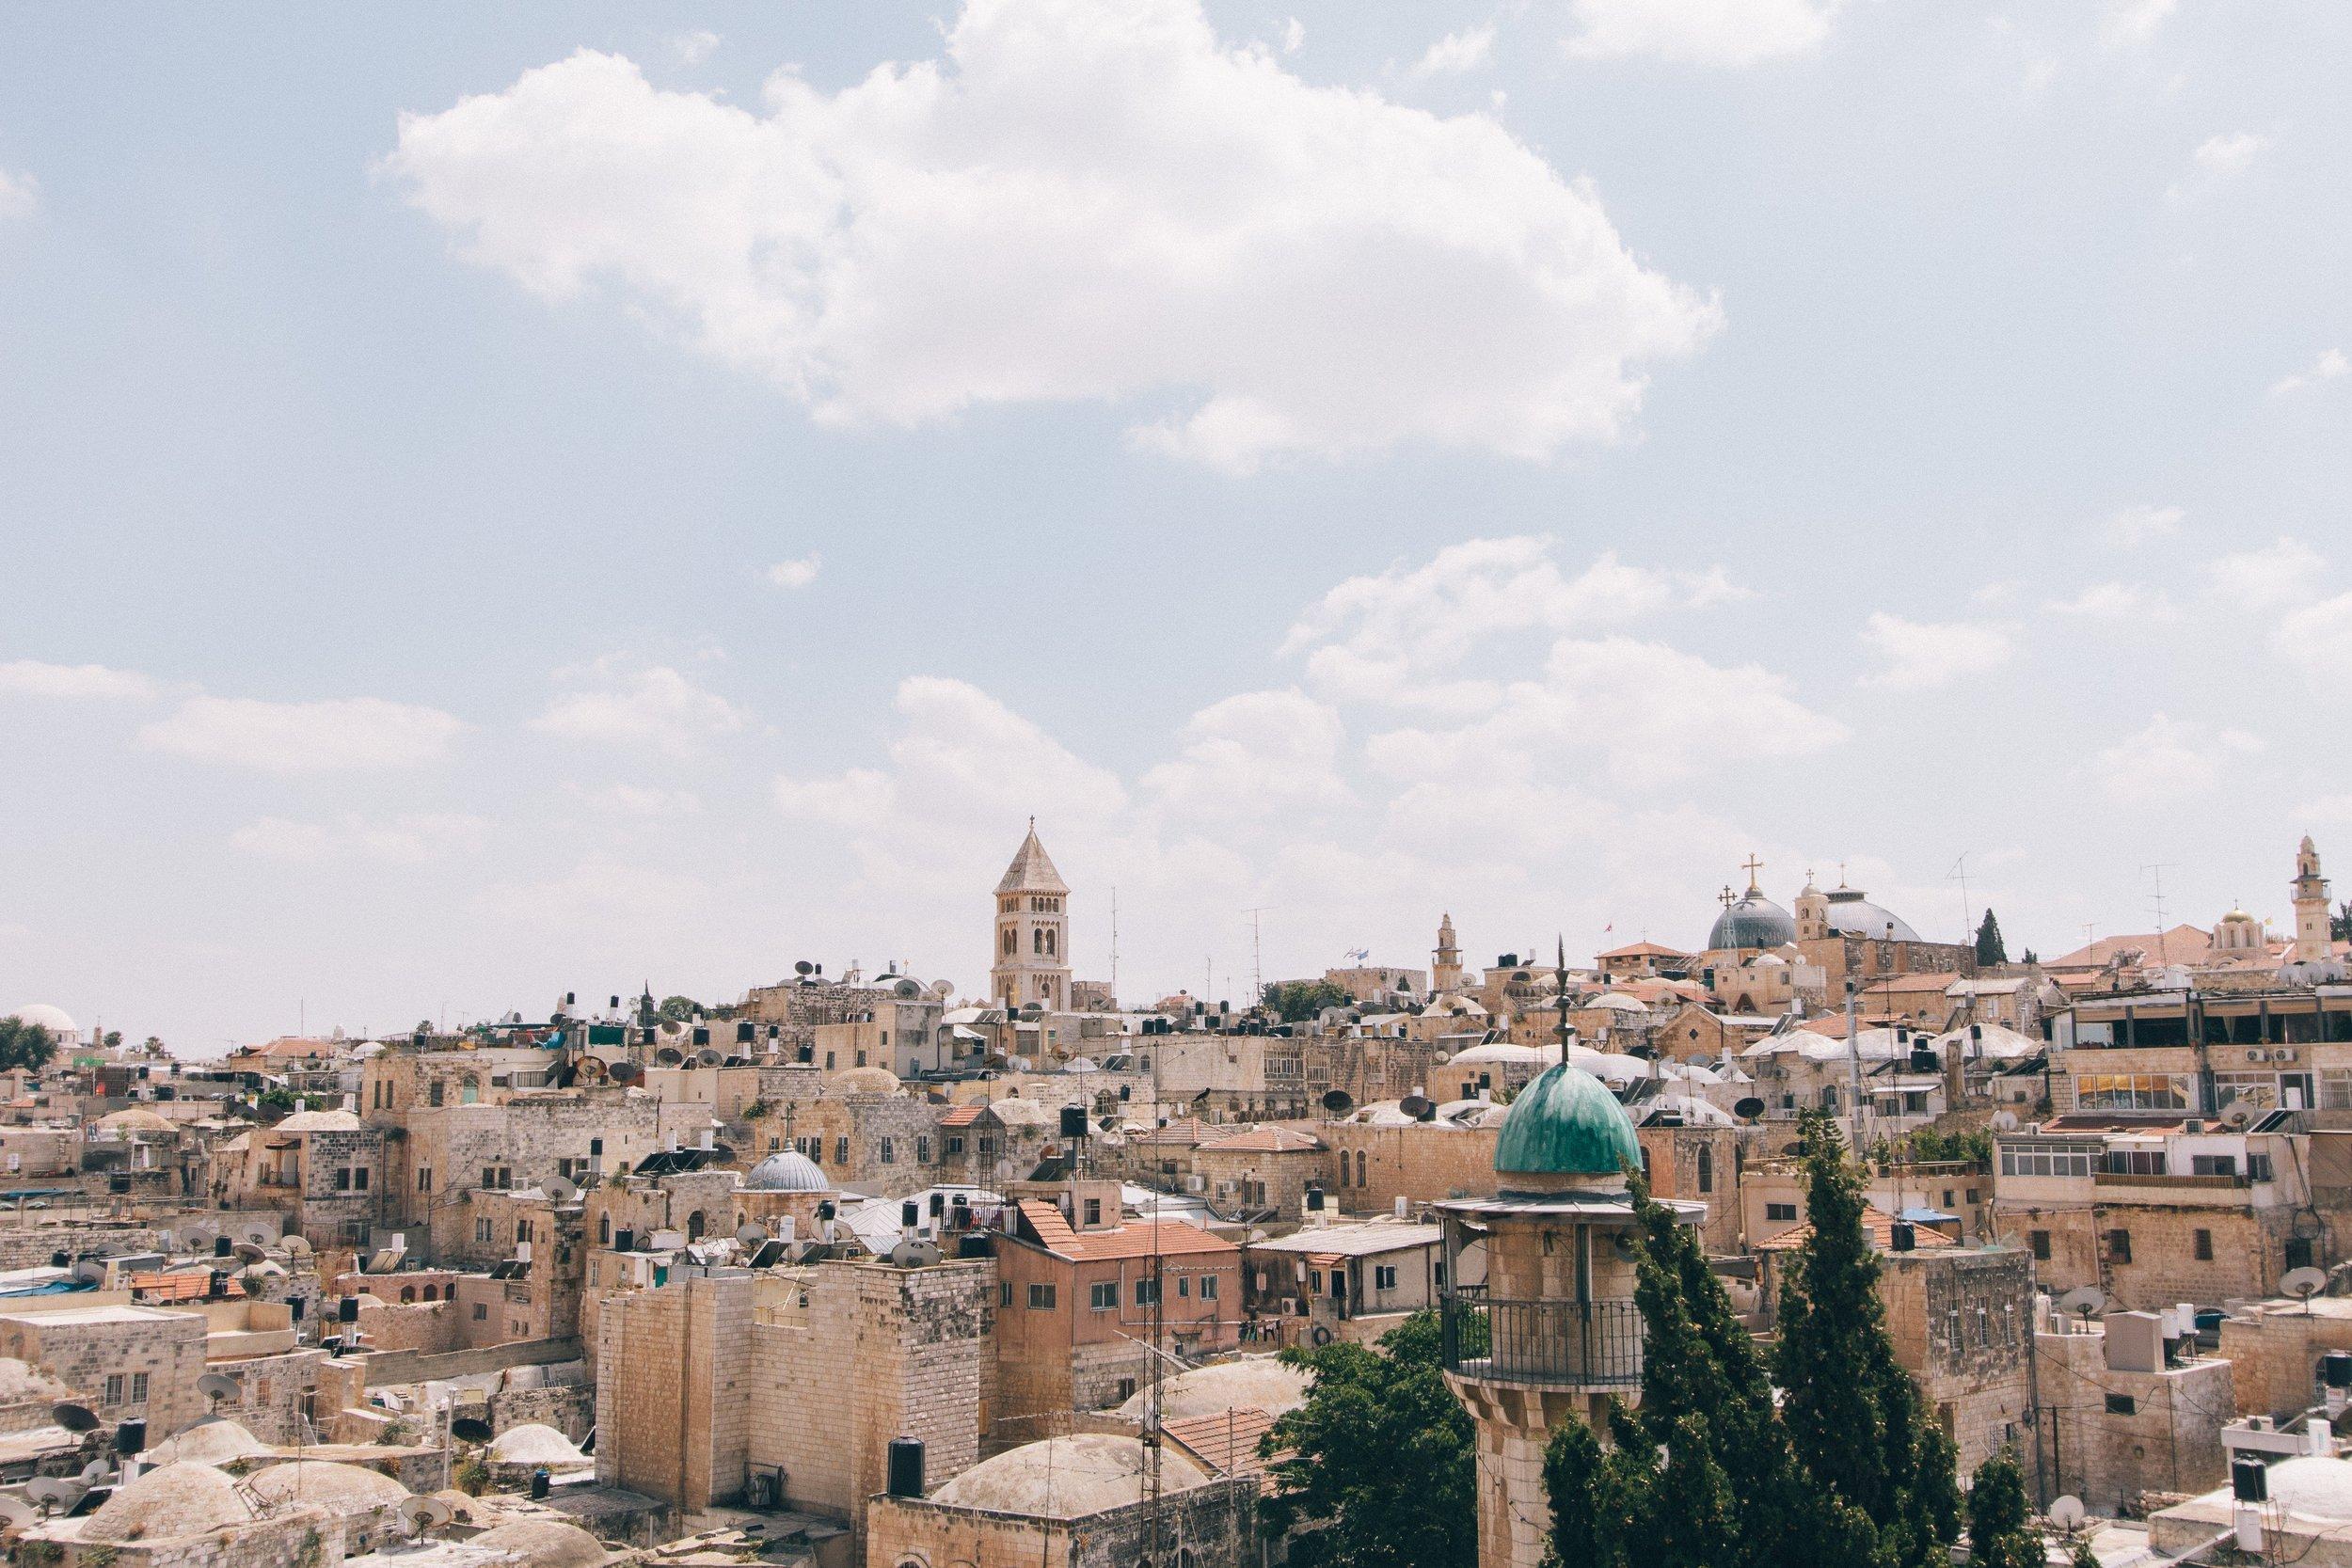 NOVEMBER 10 - 23, 2019 - Israel & Jordan with Sightseeing in Dubai